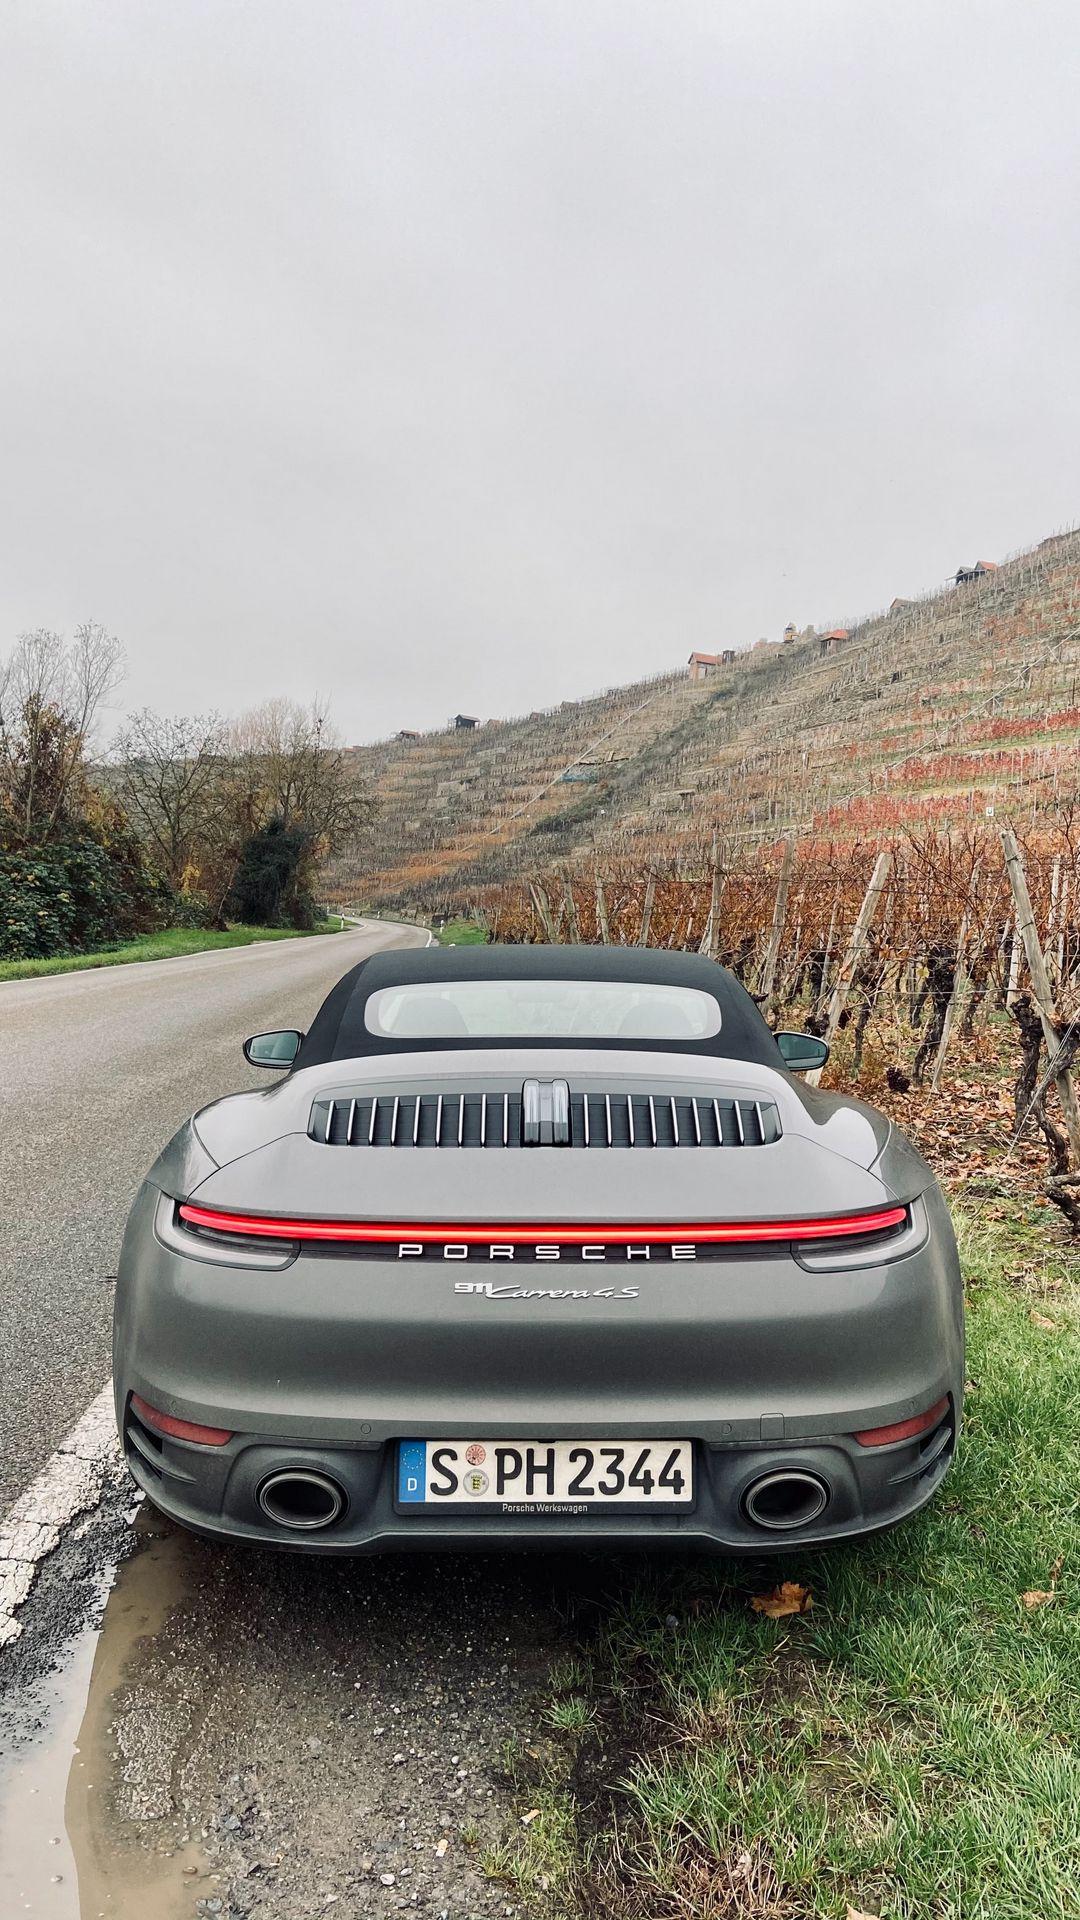 Porsche Carrera Gray Series Wallpapers Free Download